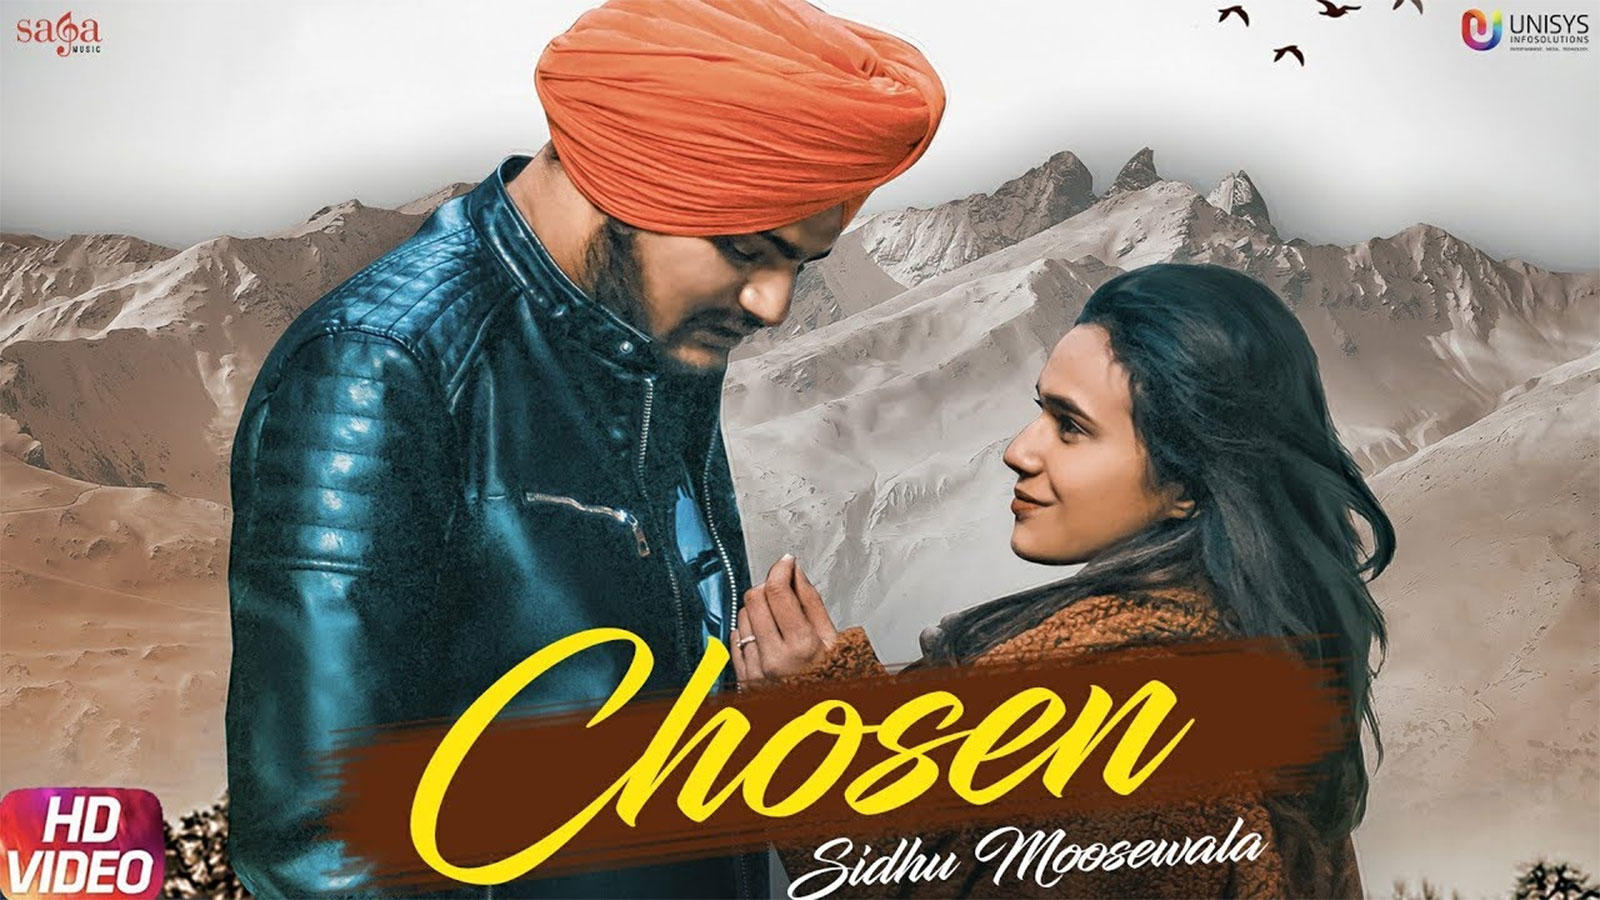 Latest Punjabi Song Chosen Sung By Sidhu Moosewala Ft Sunny 1600x900